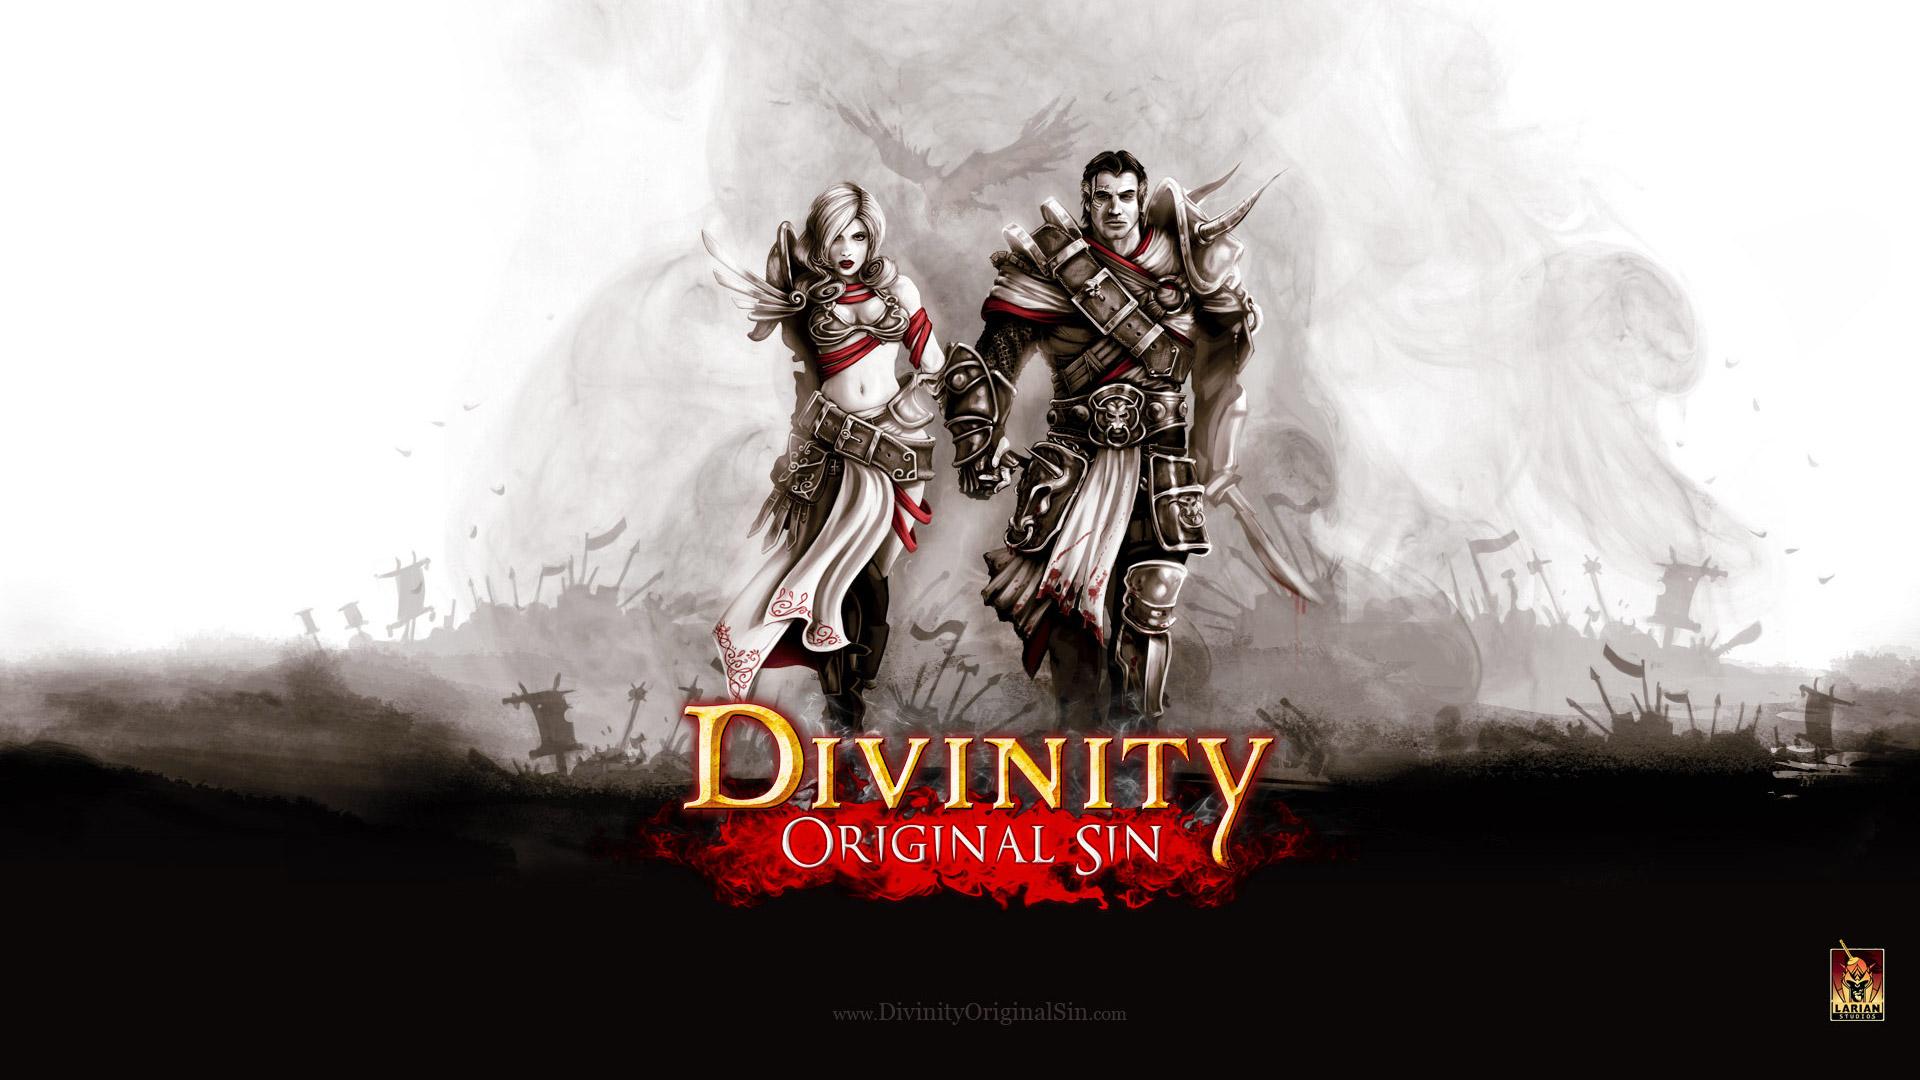 Divinity Original Sin wallpaper 1